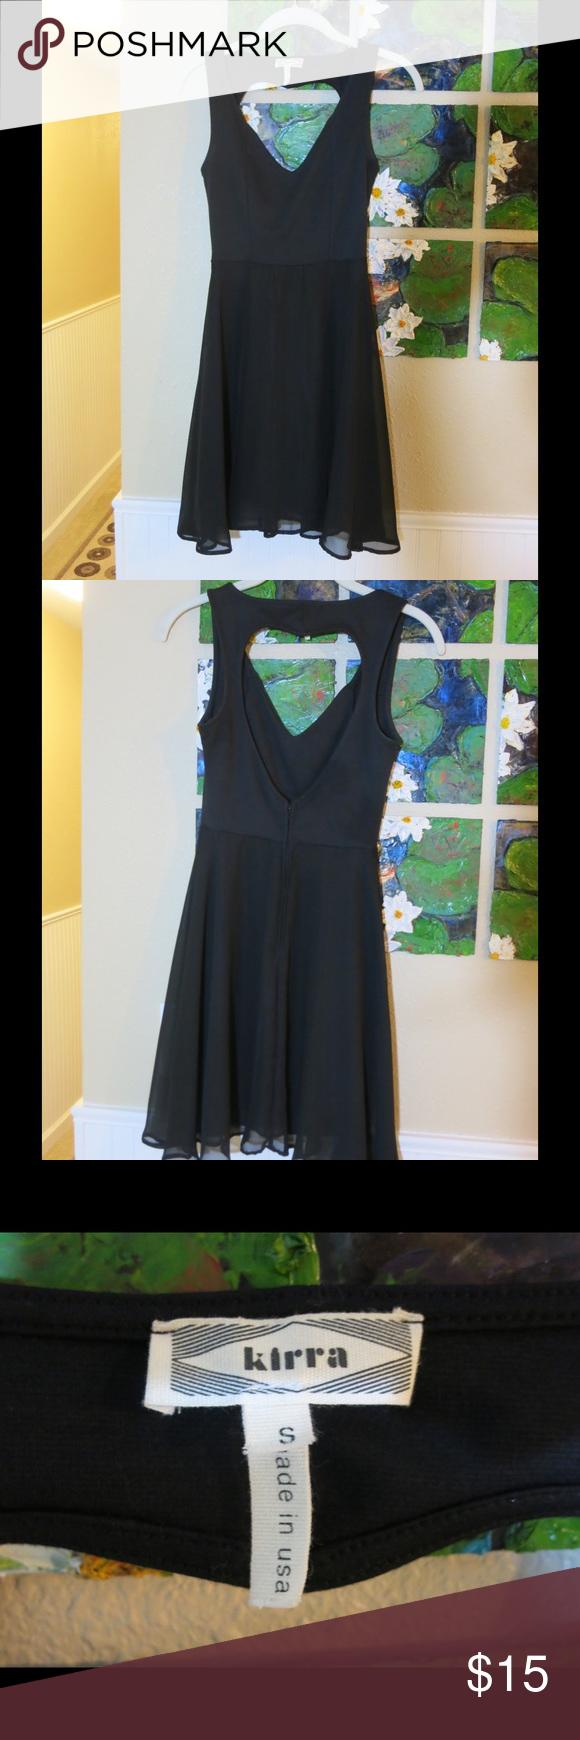 Kirra cutout heart dress black